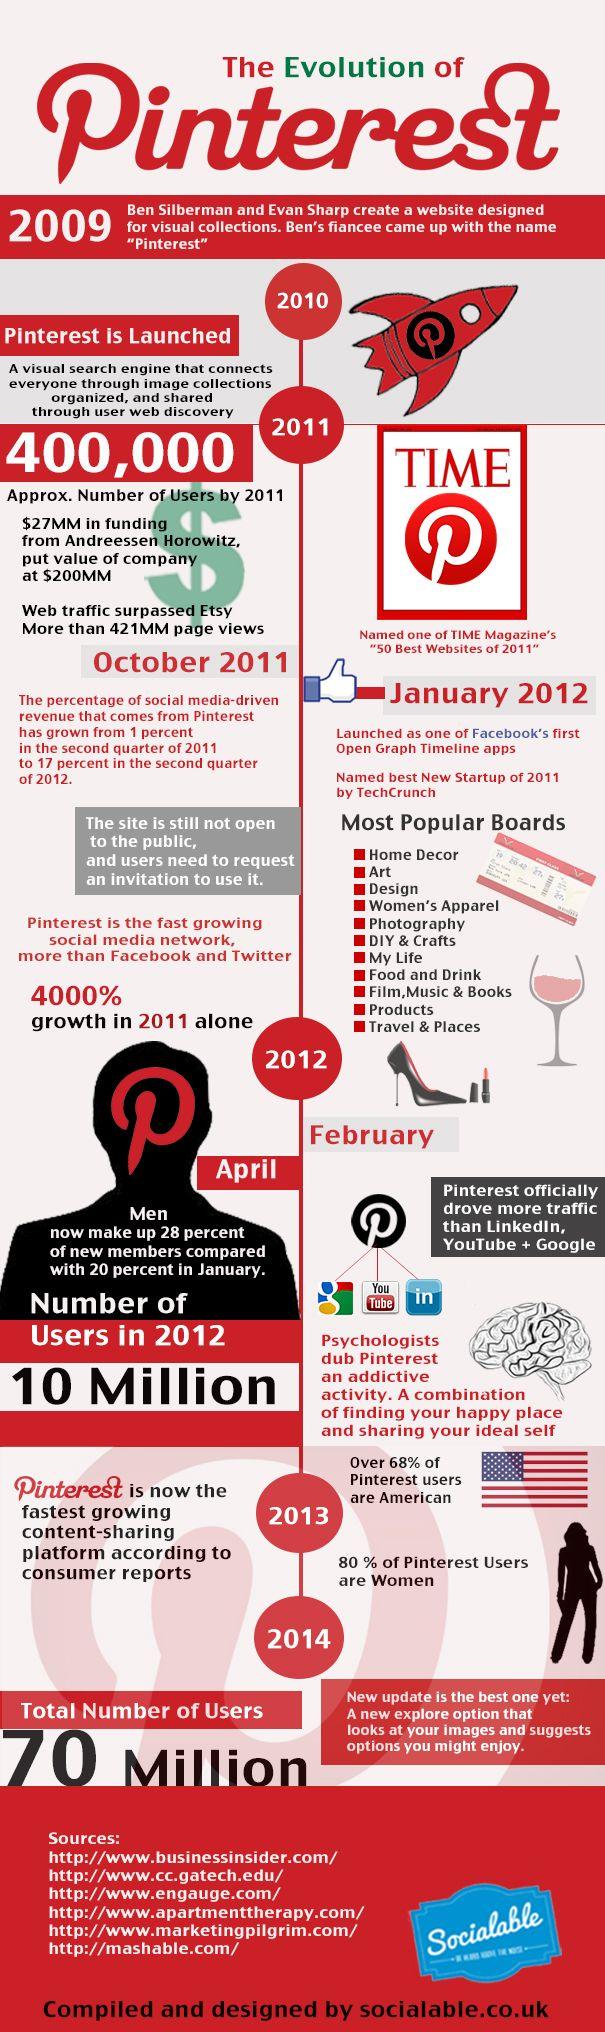 Infographic – The Evolution of Pinterest